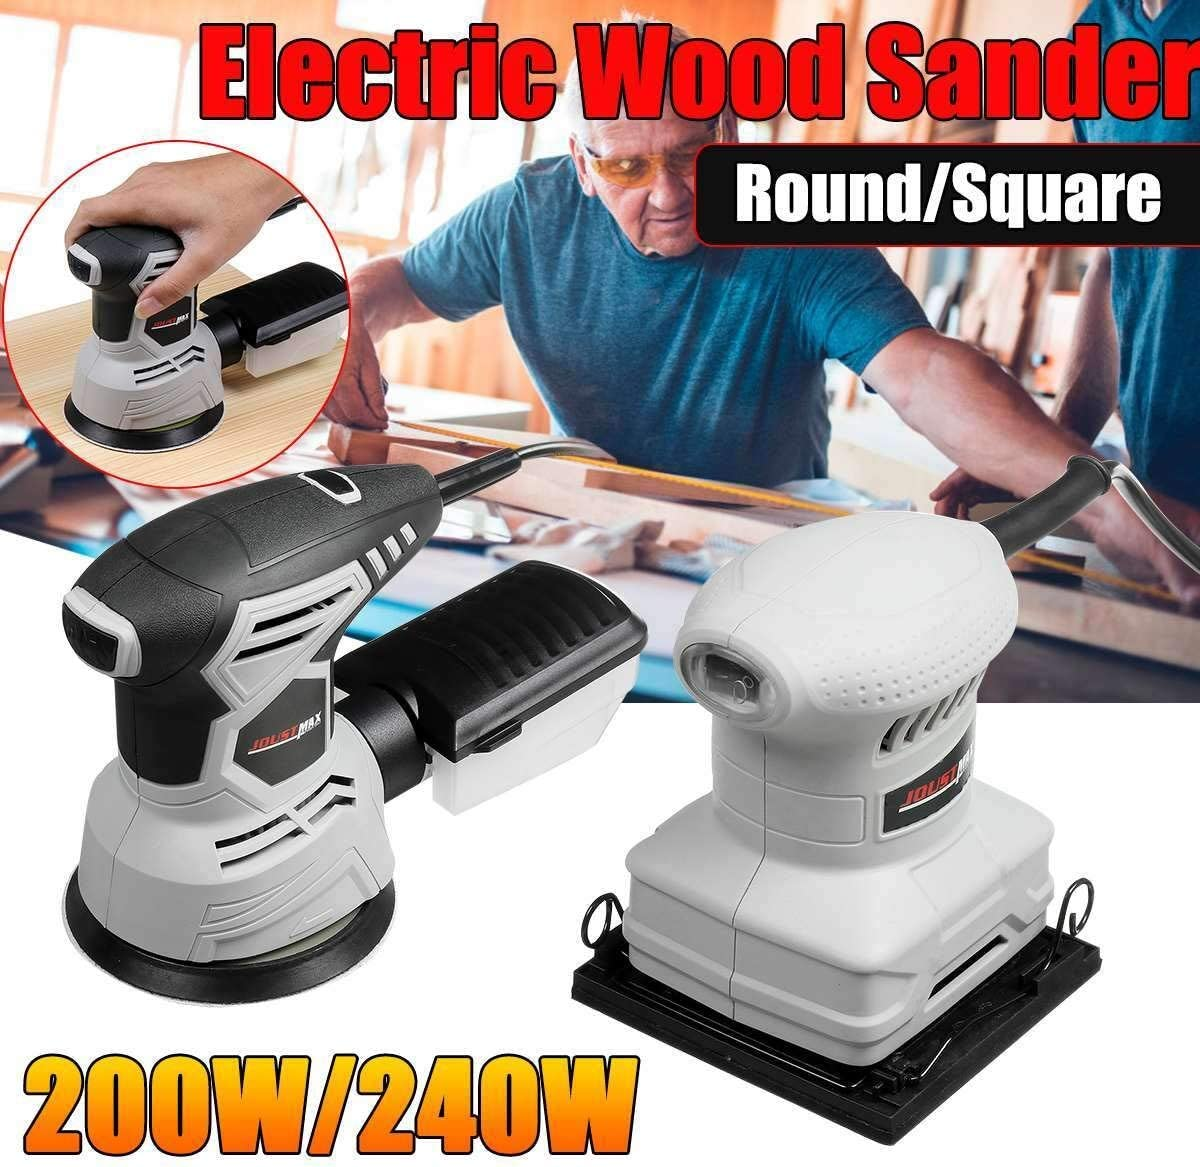 Electric Sander Including For Furniture Finishing,220V Wood Electric Sander Carpentry Tool Furniture Metal Polishing Sande Sanders With Dust Collection Detail Sander Compact Sander Machine For Wood